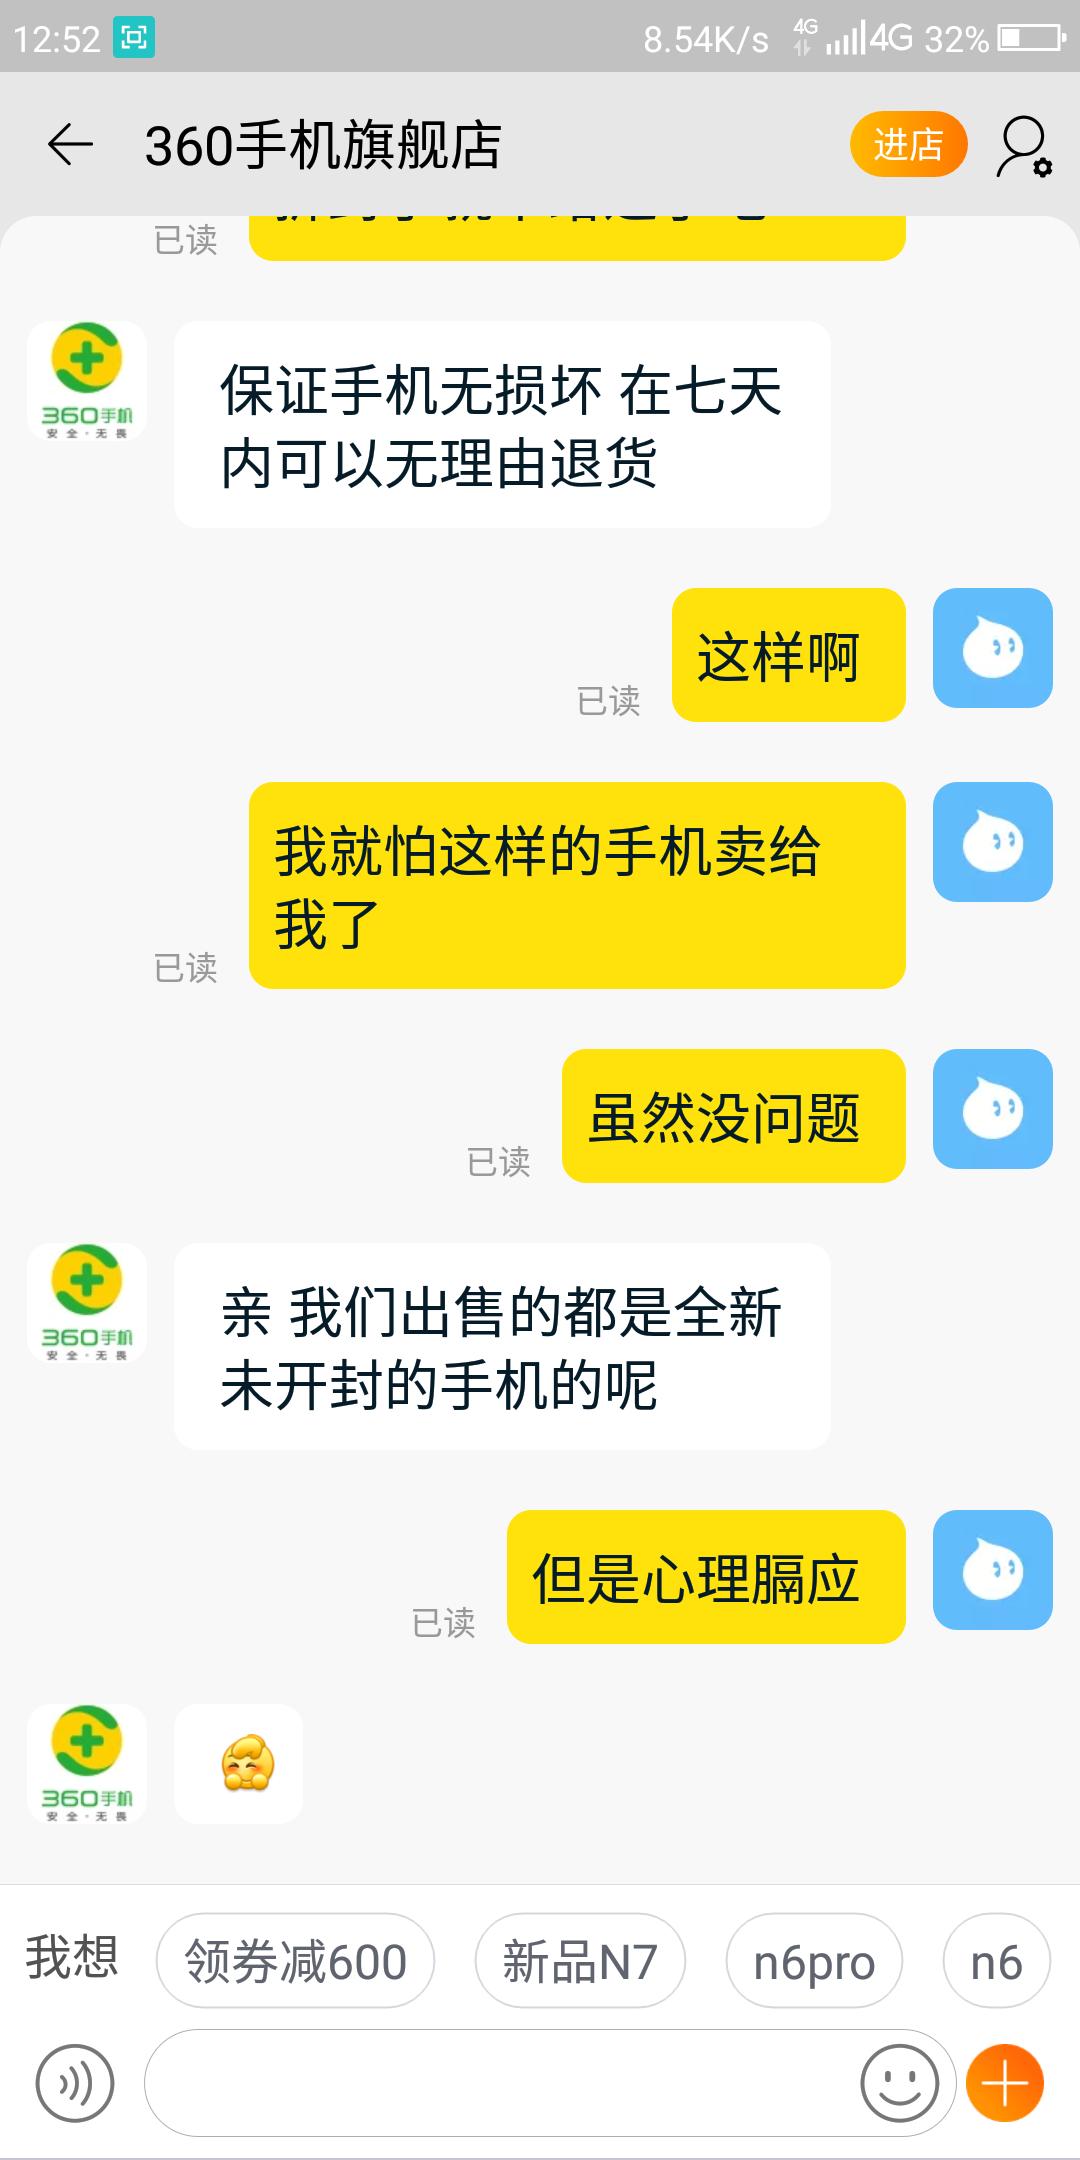 Screenshot_2018-07-12-12-52-42.png